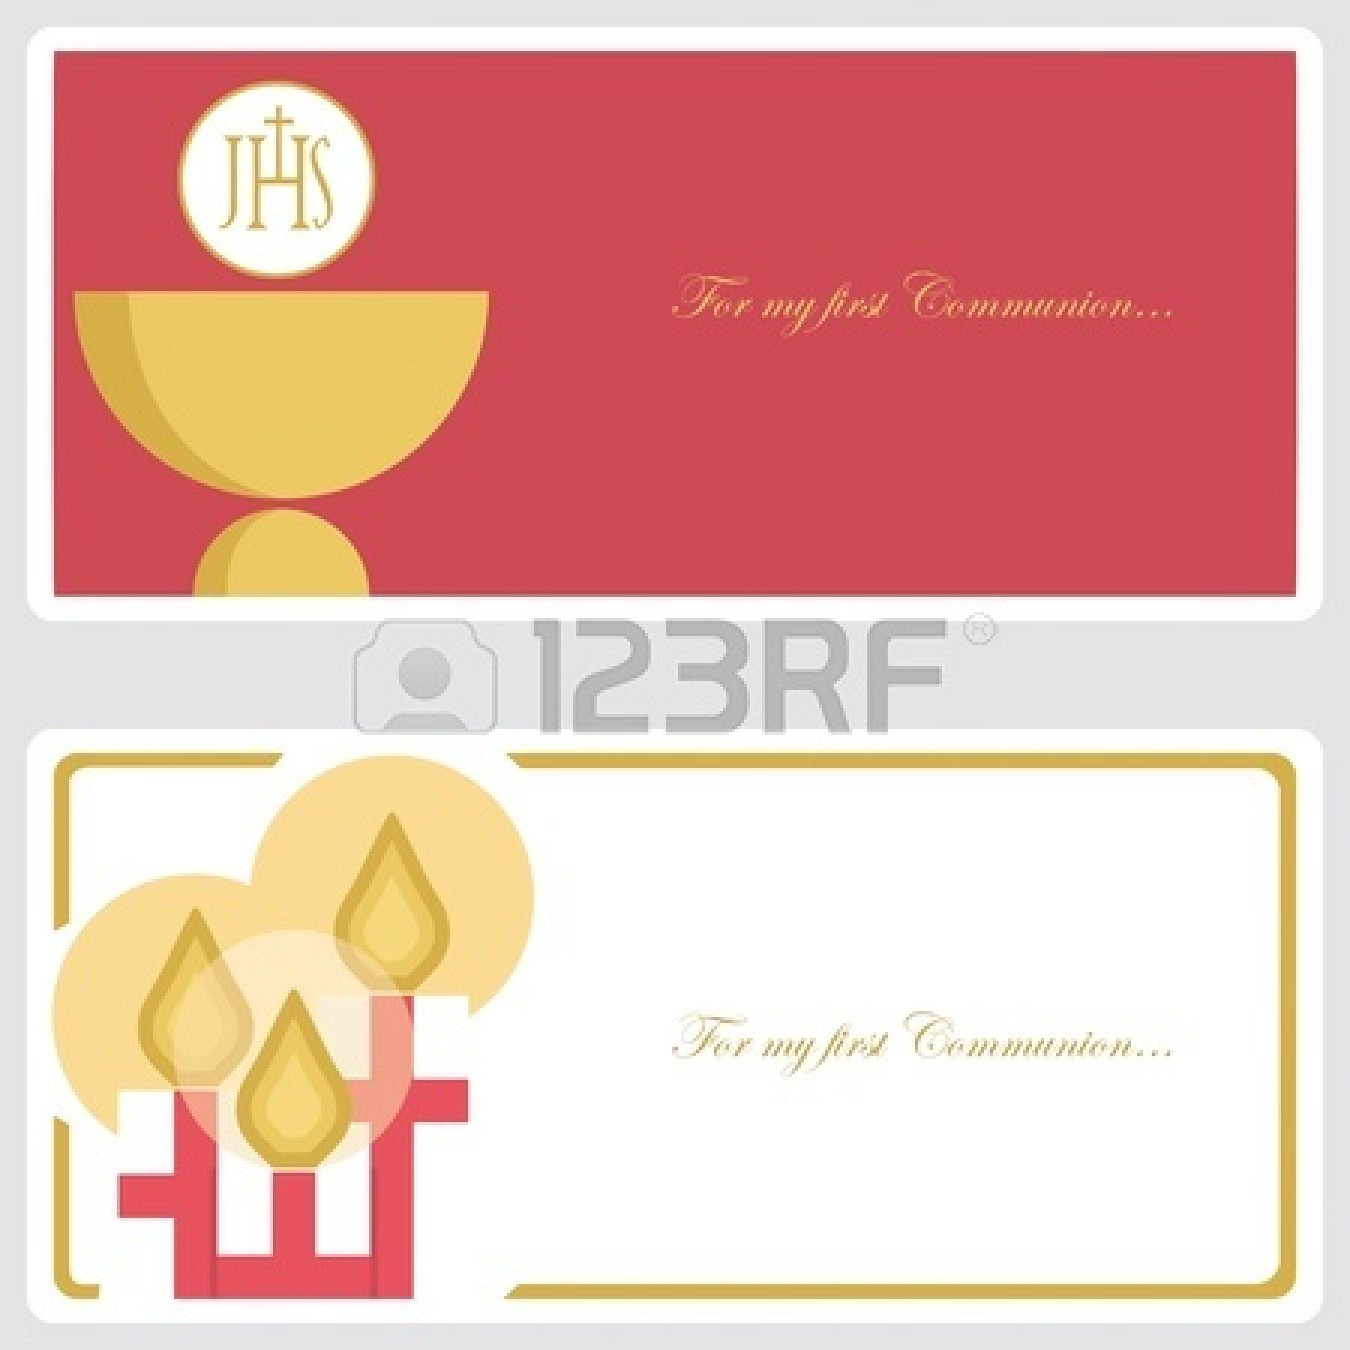 Catholic First Communion Cross Clip Art | Clipart Panda - Free ...